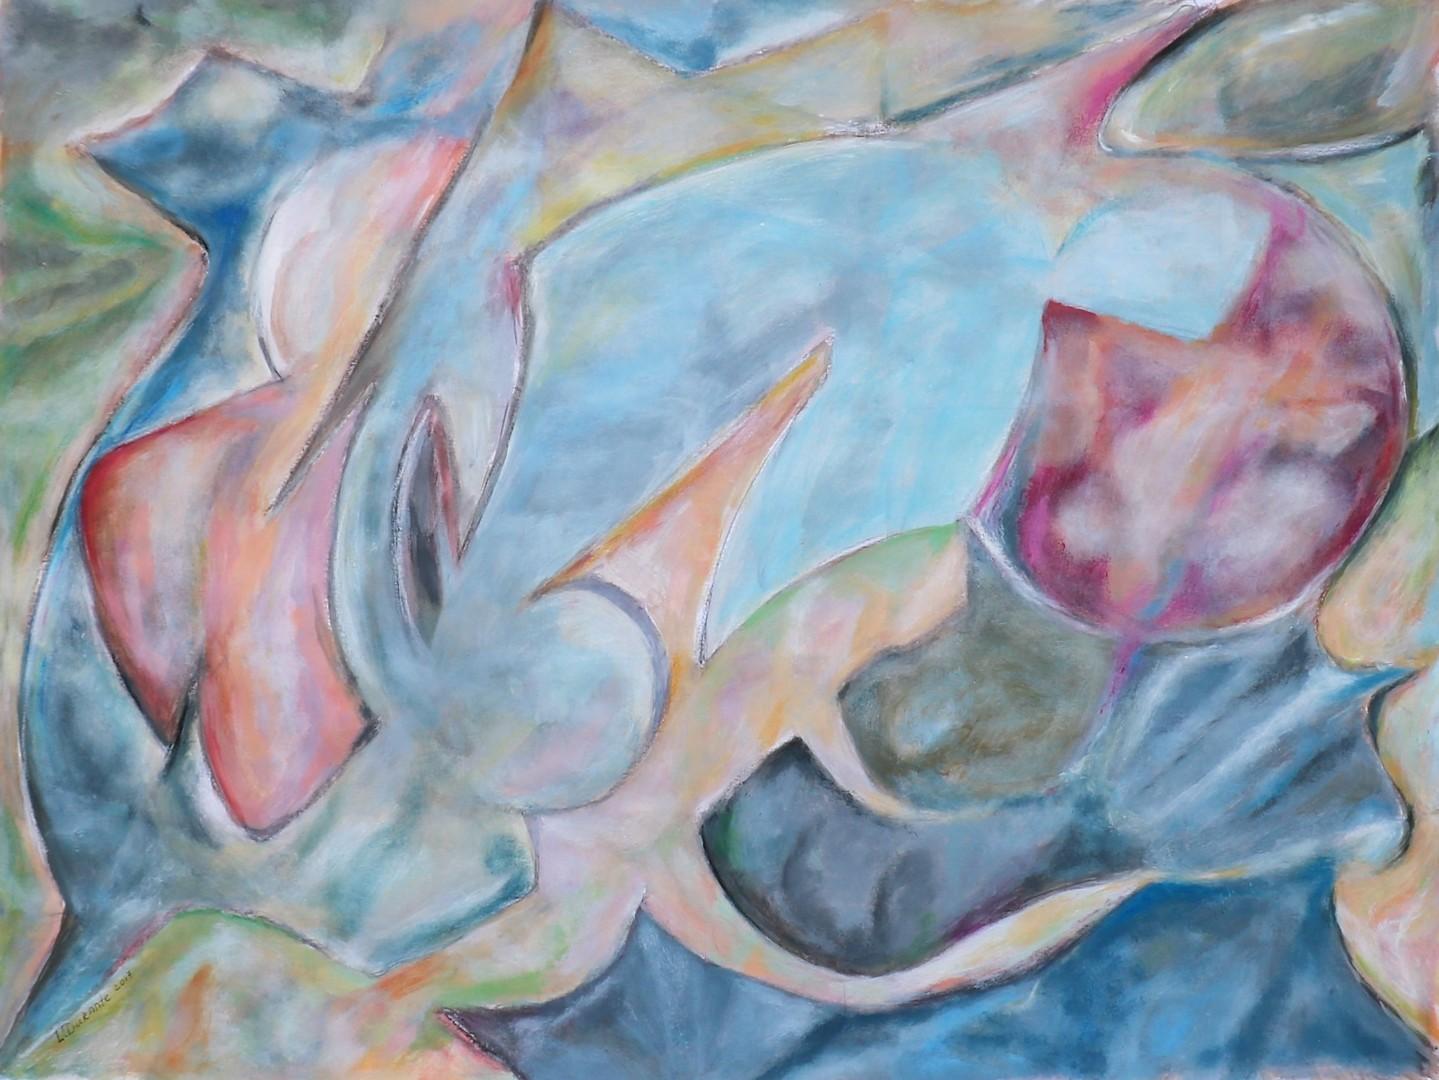 Liudmyla Durante Art & Jewelry - Other worlds